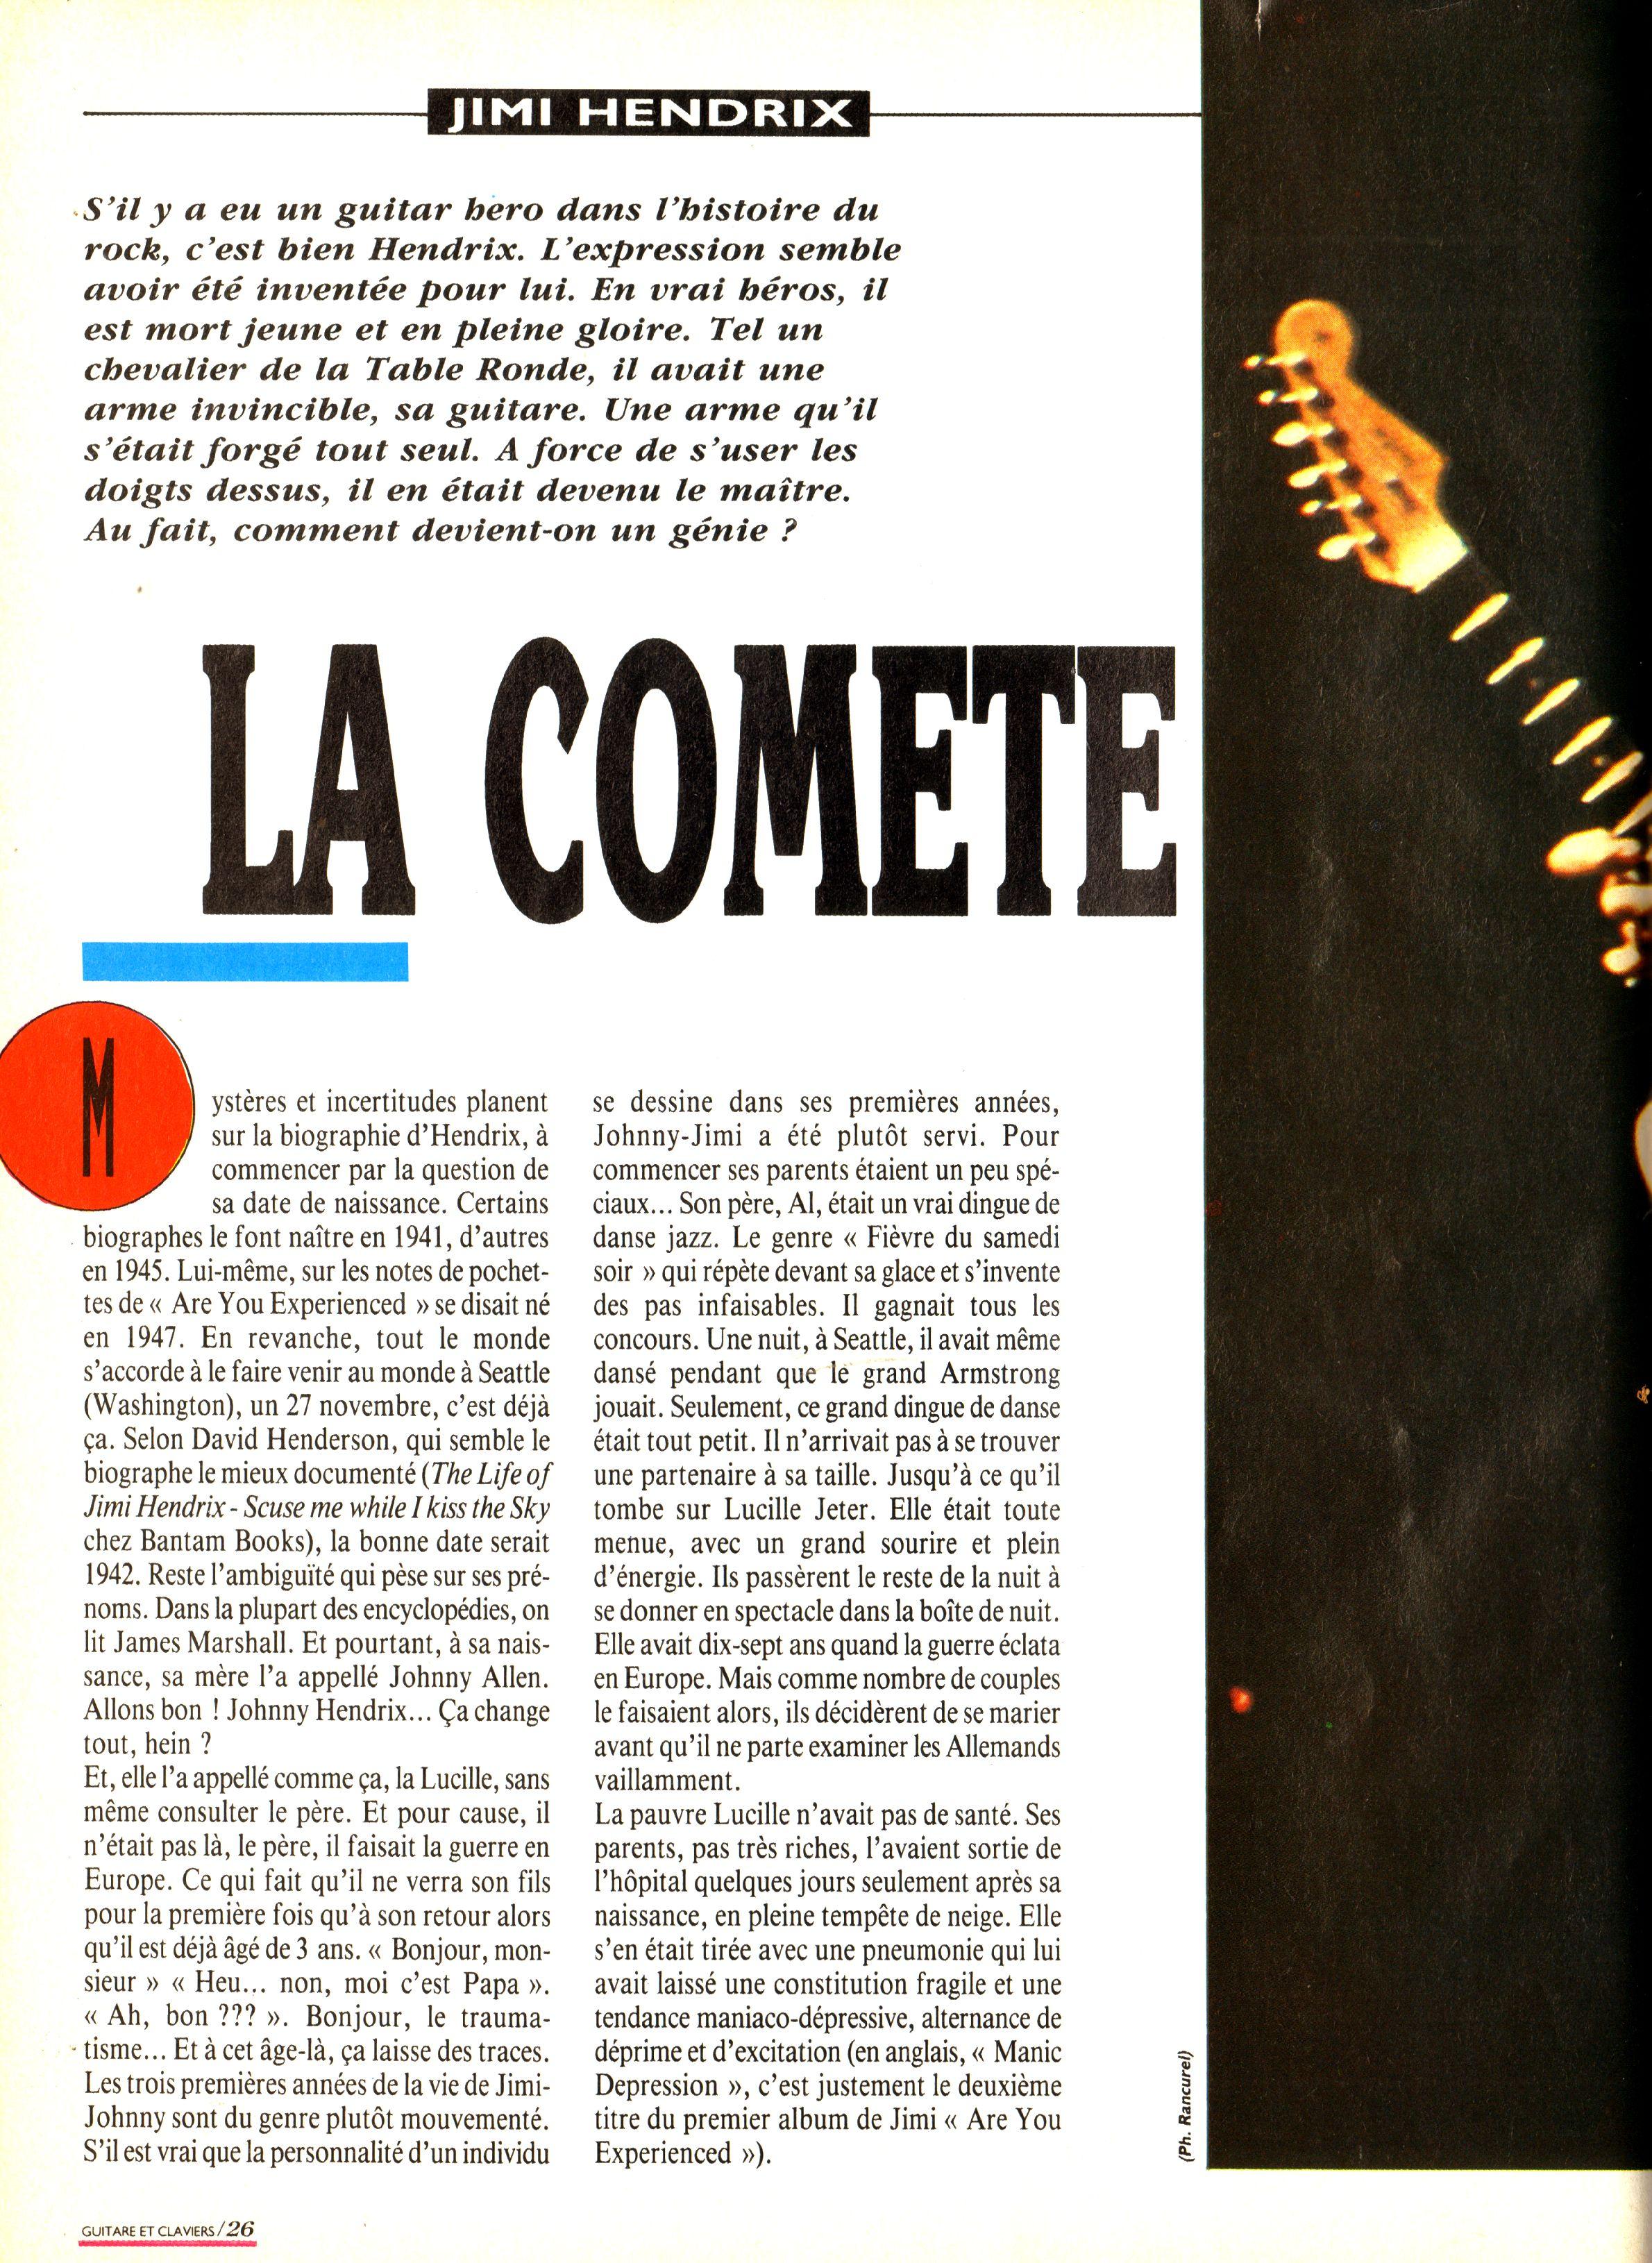 Magazines Français 1989 - 2014 GuitareClaviersMars1989Page26